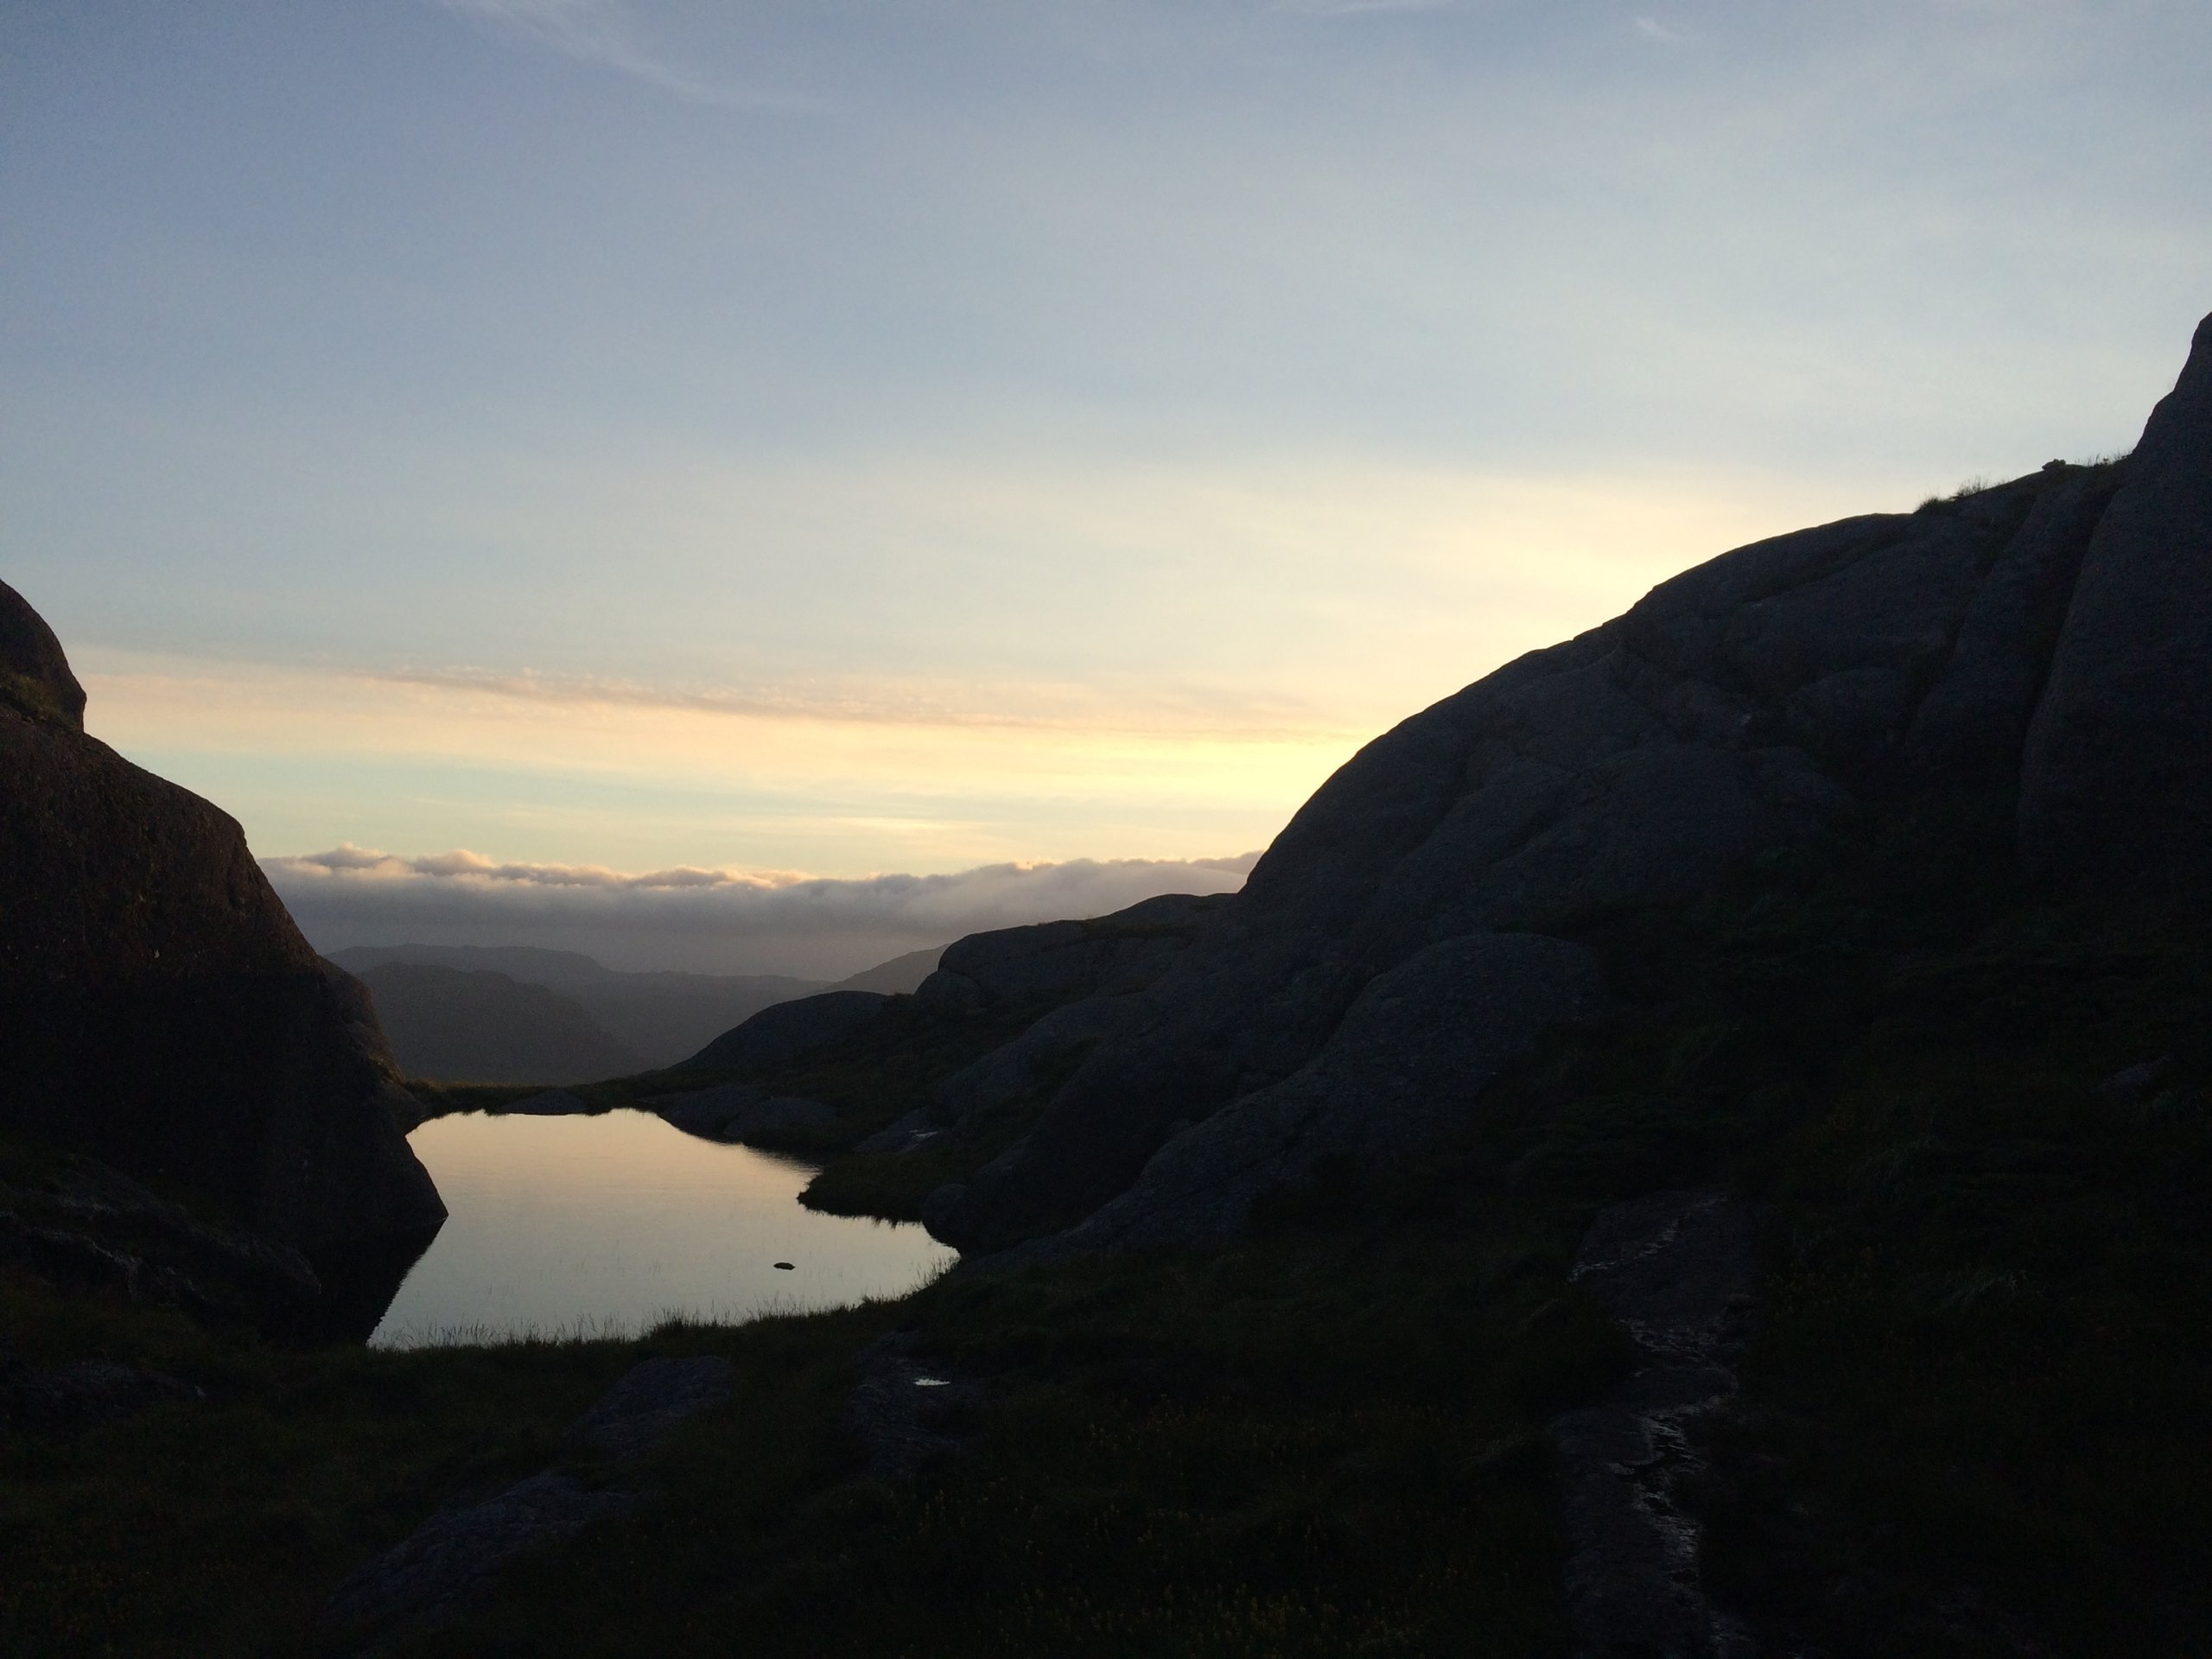 Evening hike